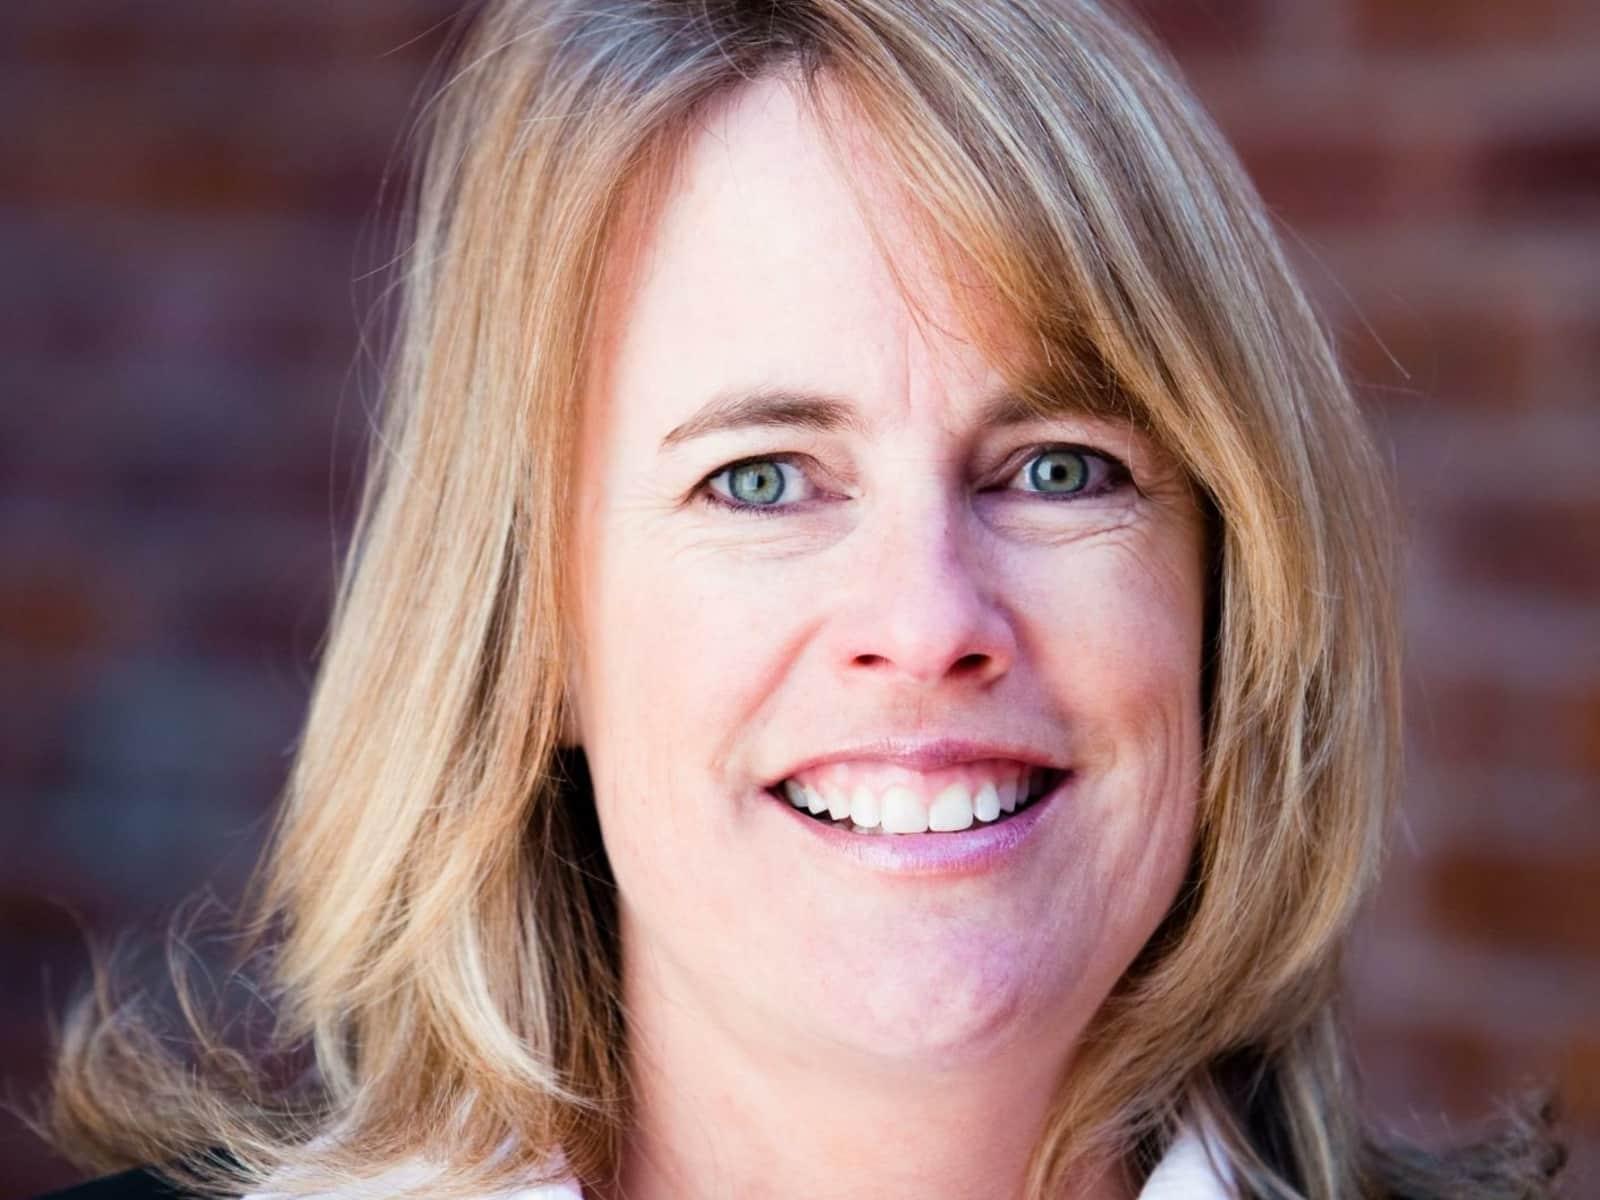 Linda from Boulder, Colorado, United States